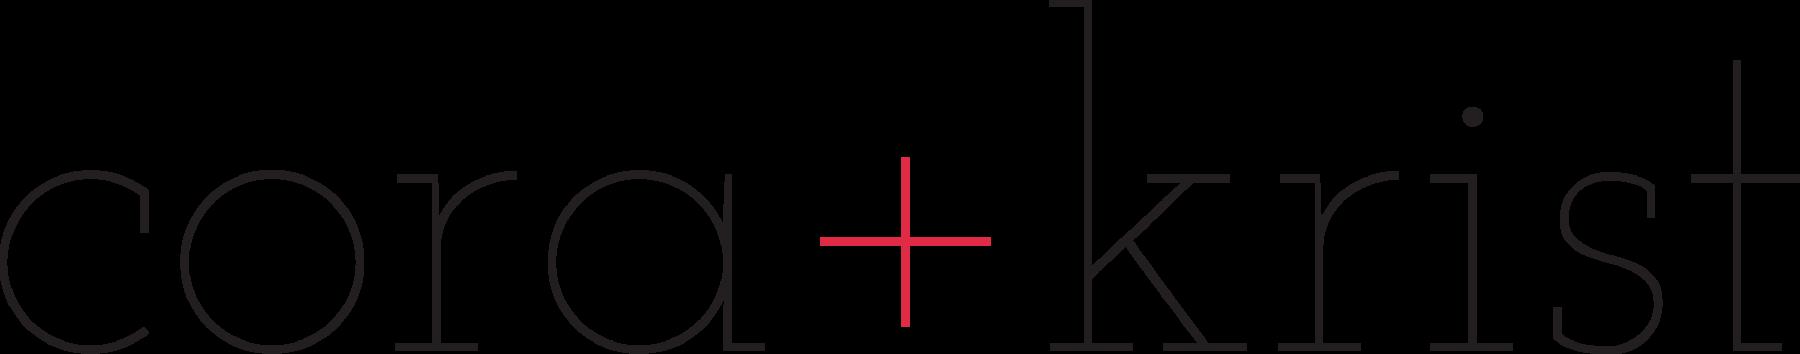 cora+krist